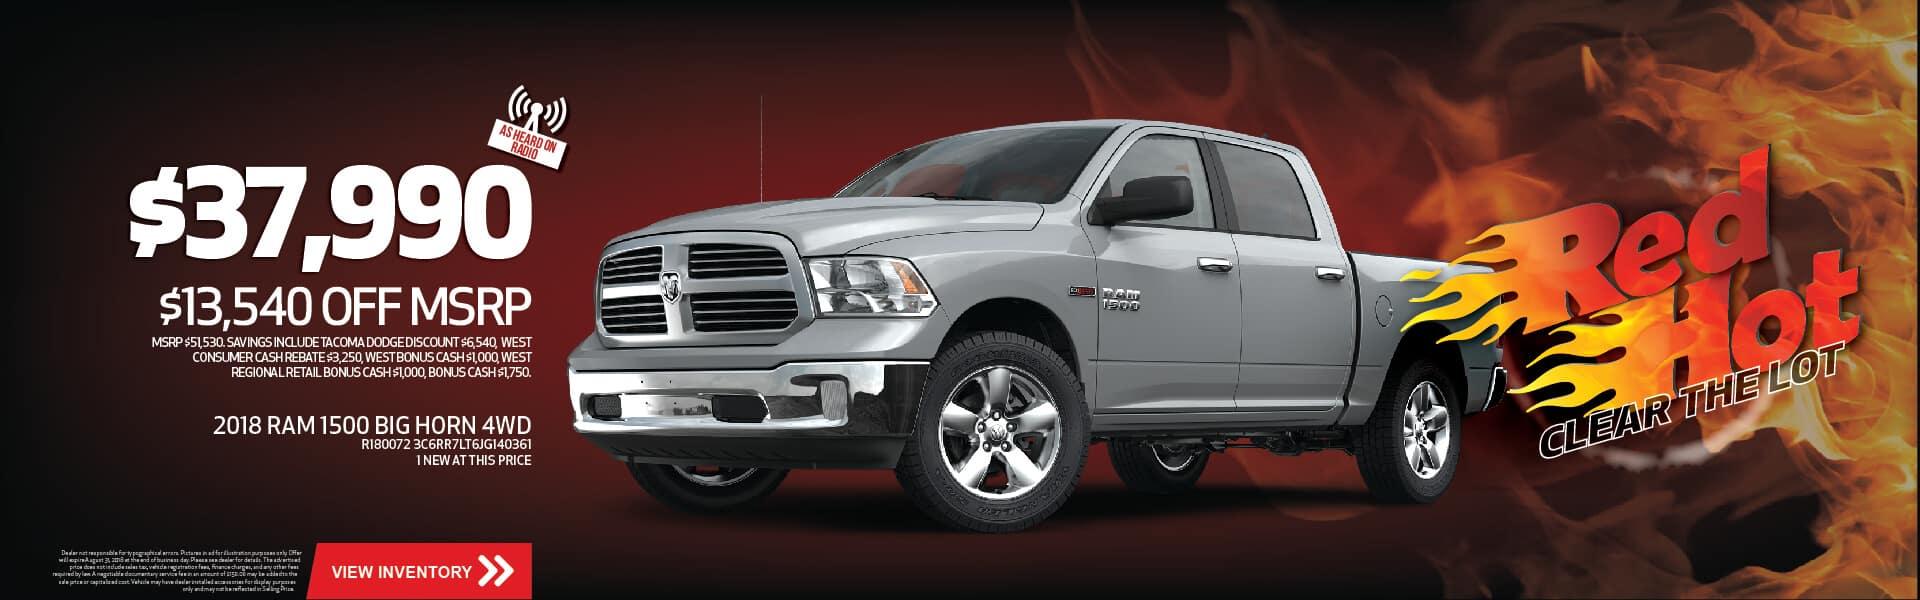 Dodge dealer in tacoma wa tacoma dodge chrysler jeep ram solutioingenieria Choice Image